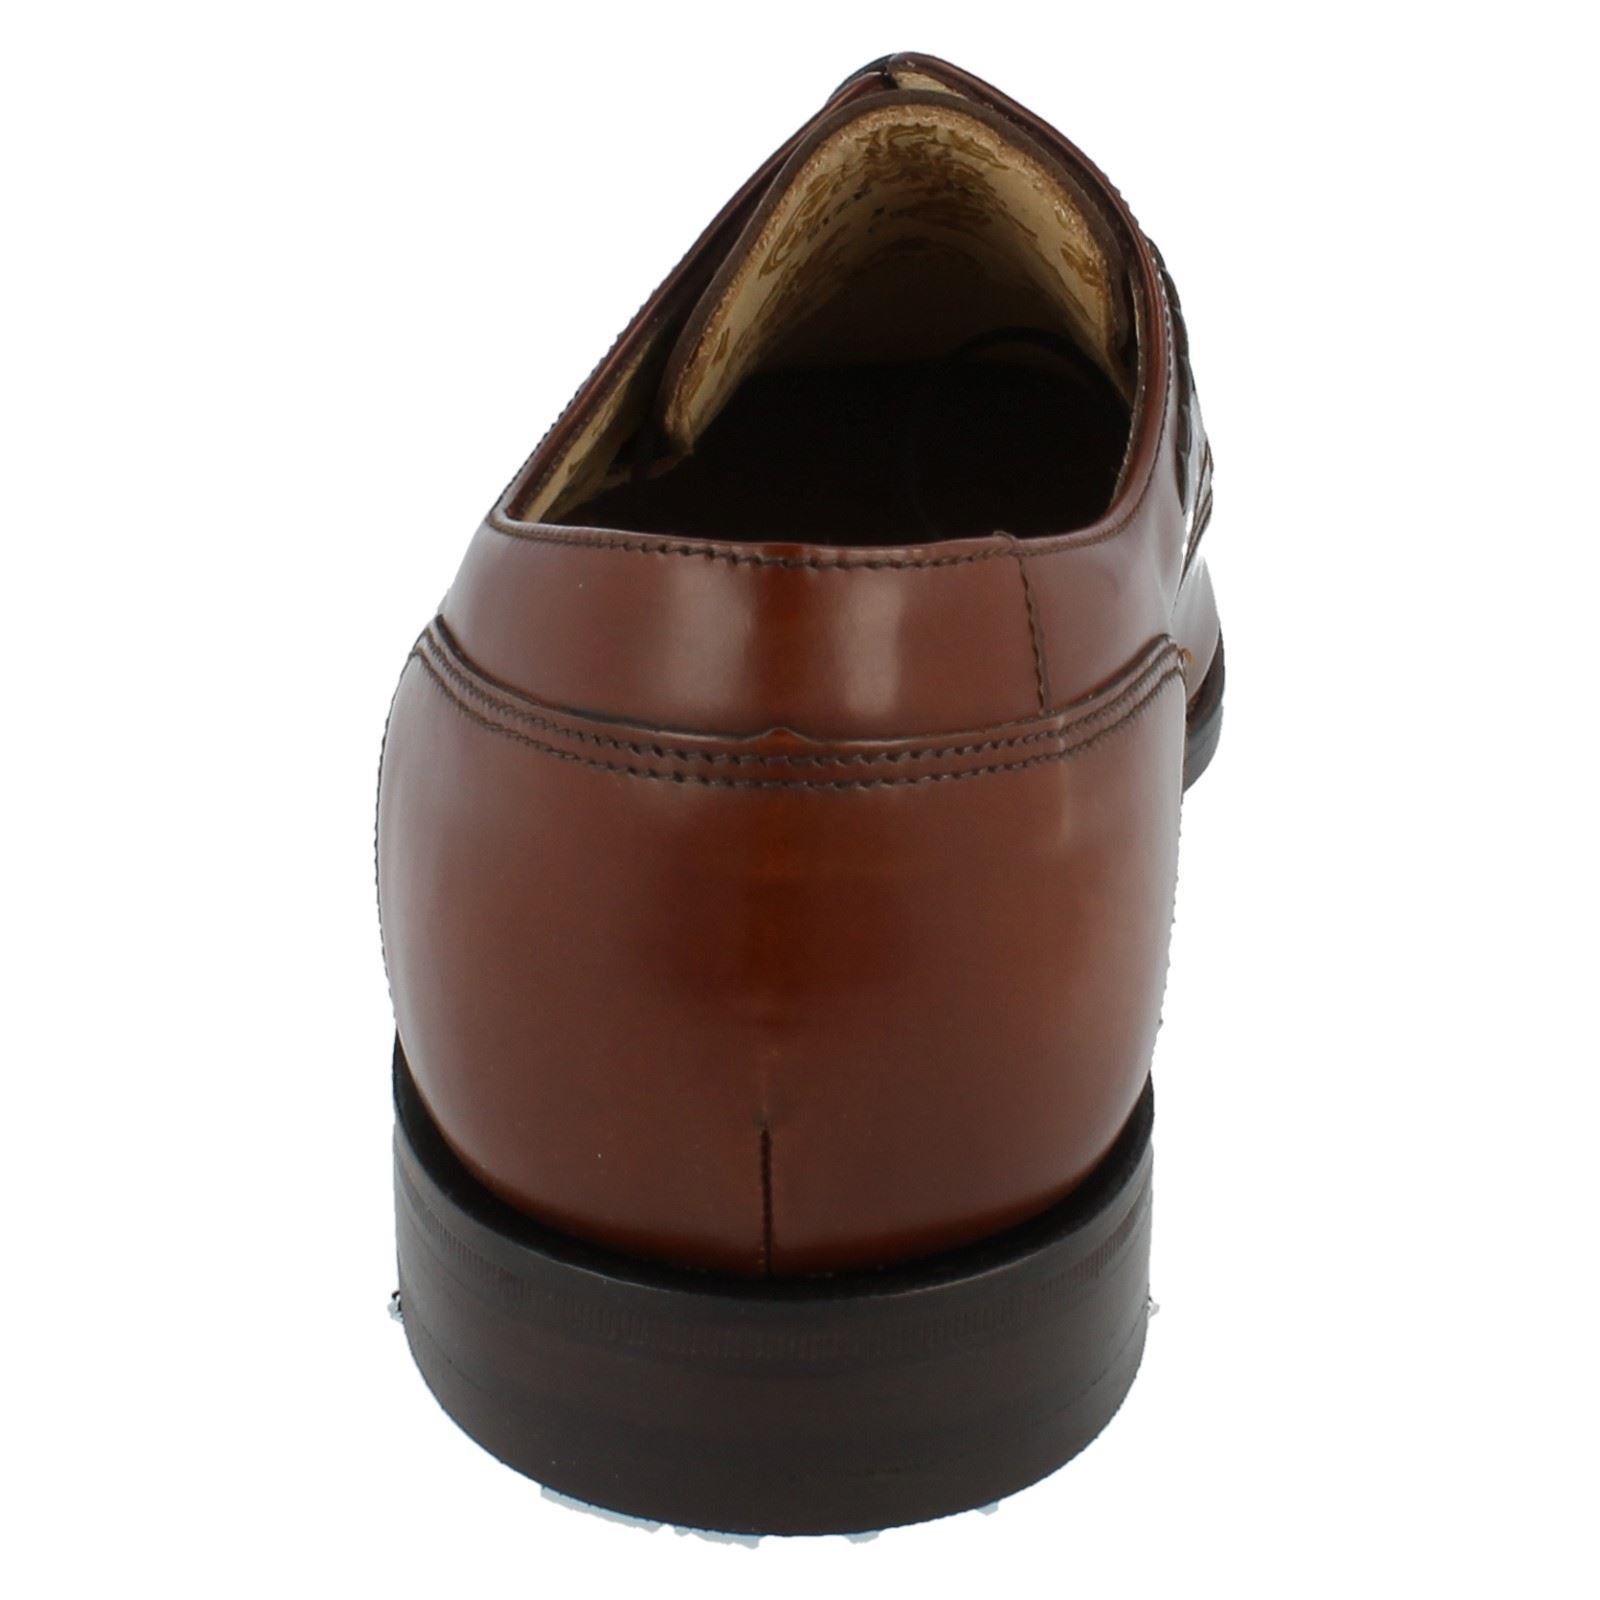 Mens Loake Formal Schuhes Fitting F Deckard